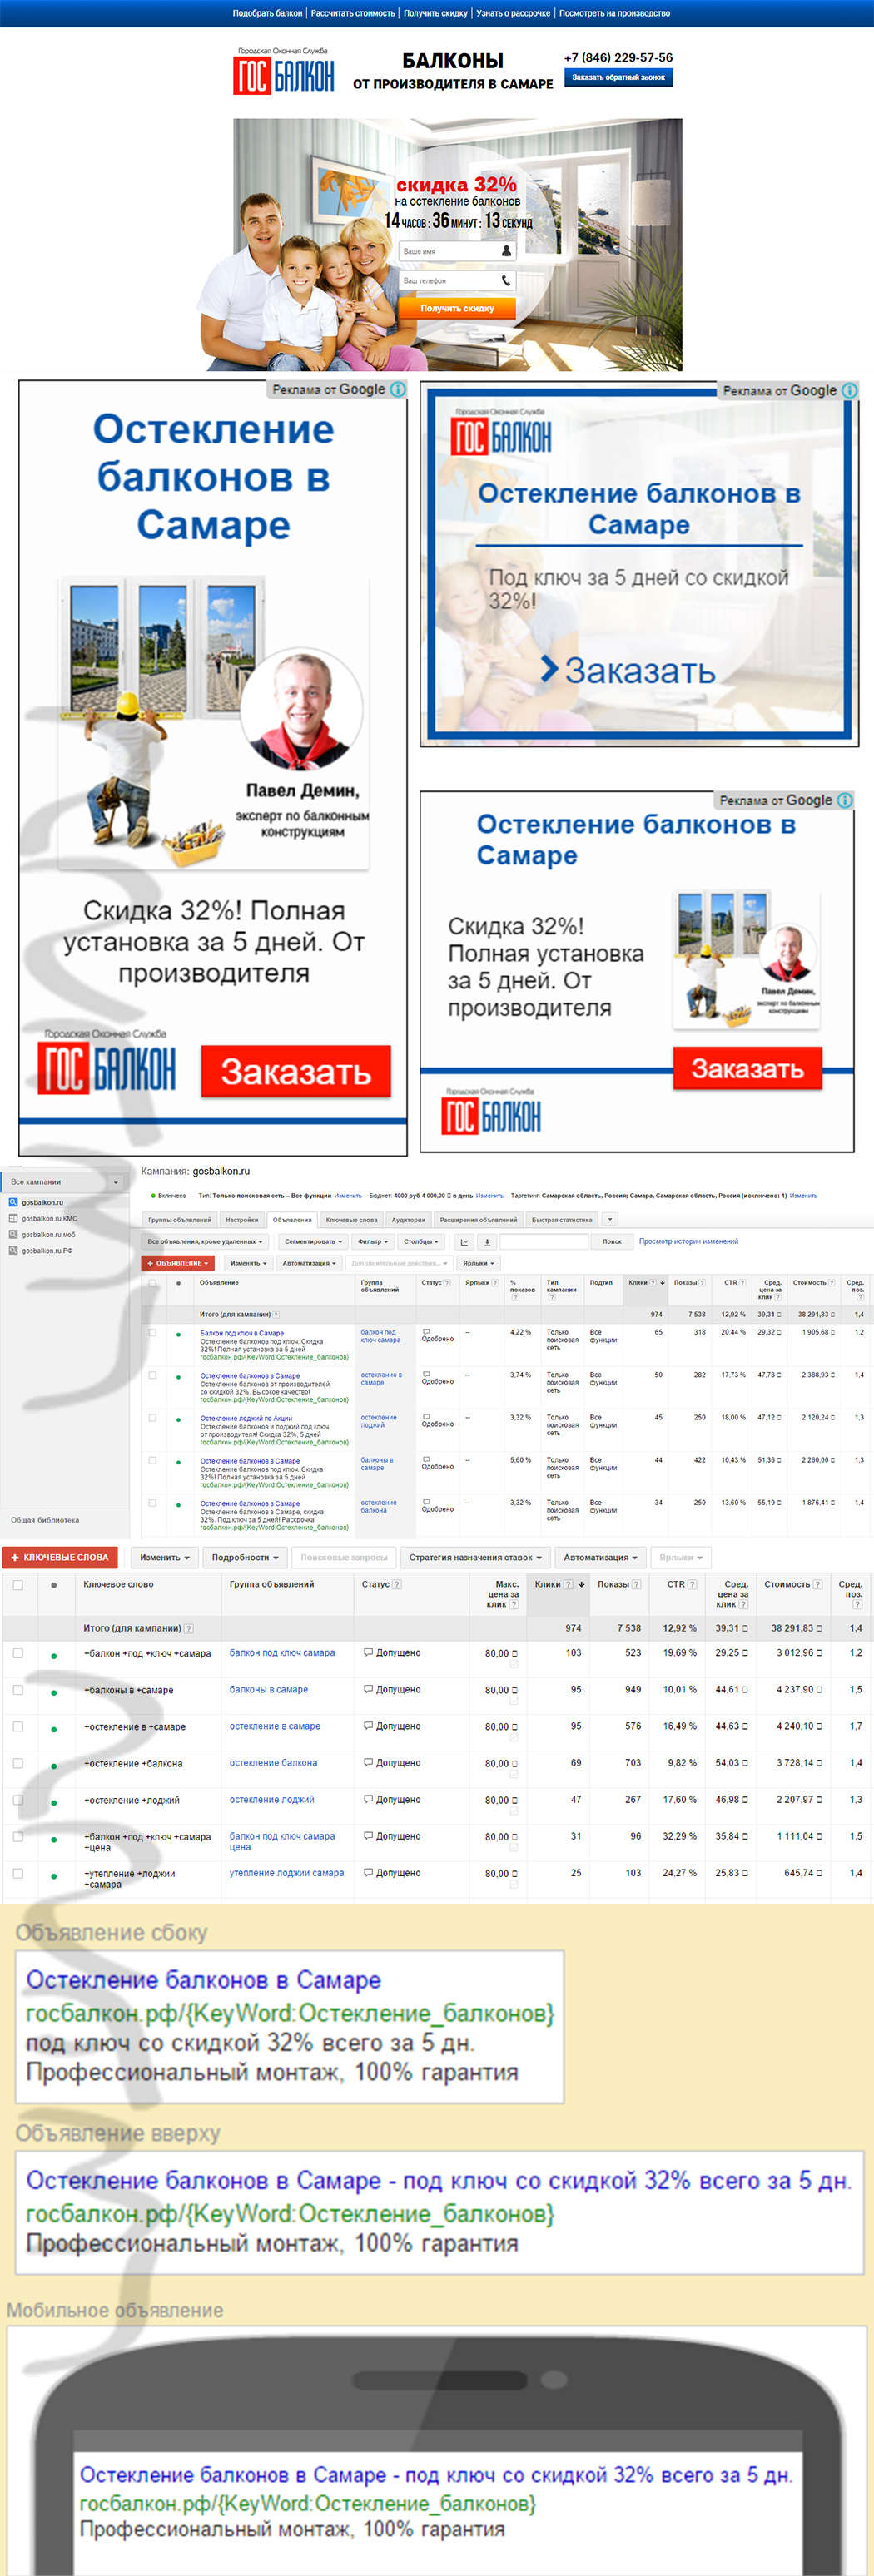 Google Ads   Самара   Остекление балконов под ключ   Услуги